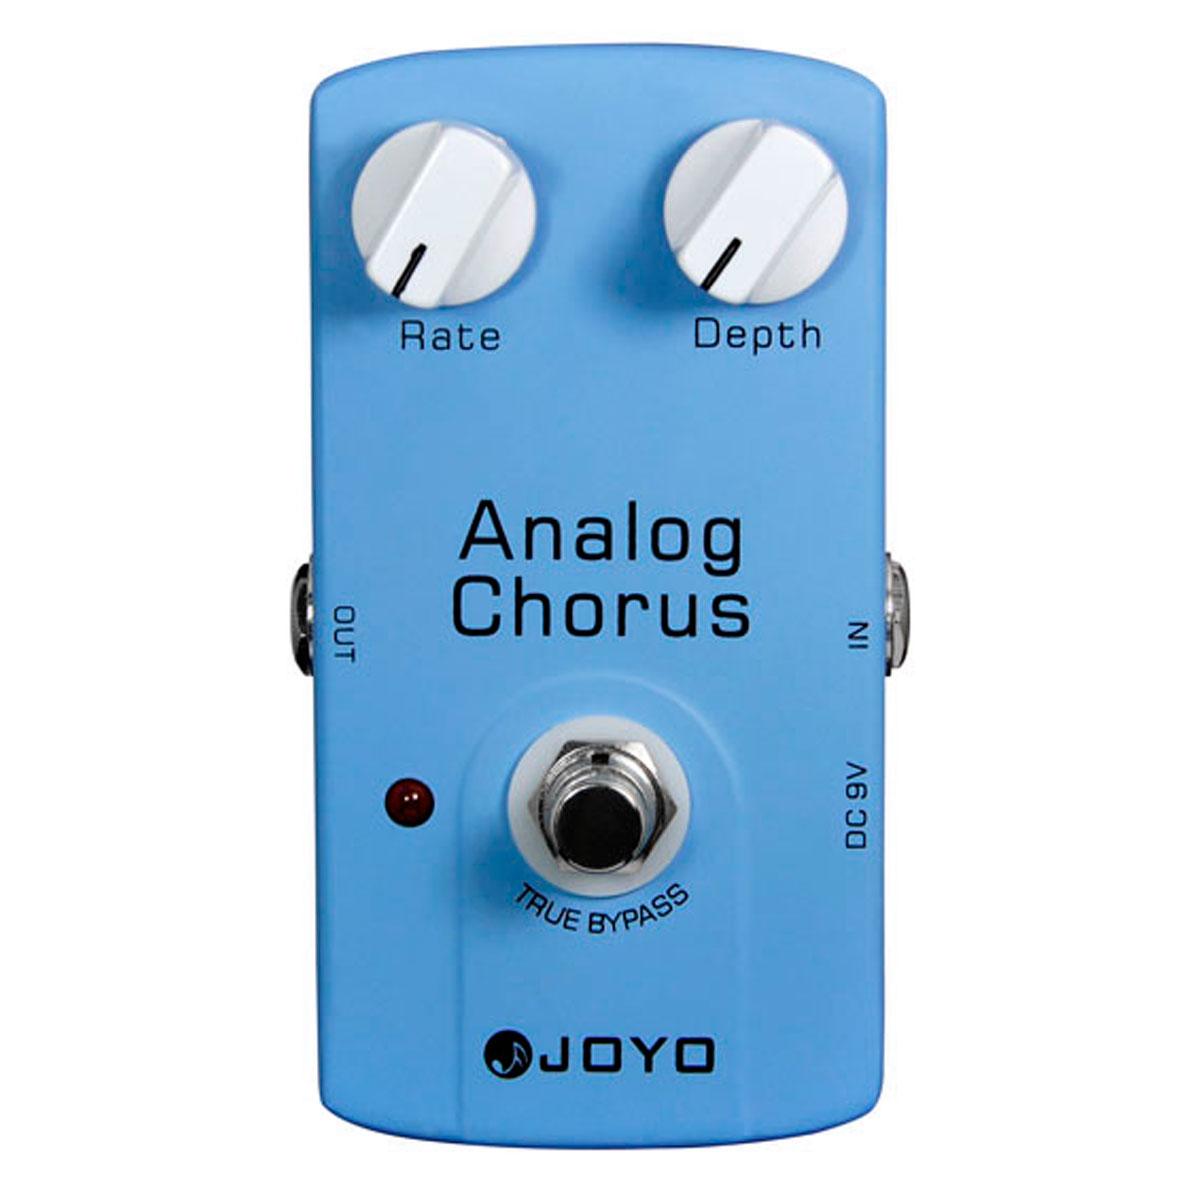 JF37 - Pedal Guitarra Analog Chorus JF 37 - JOYO